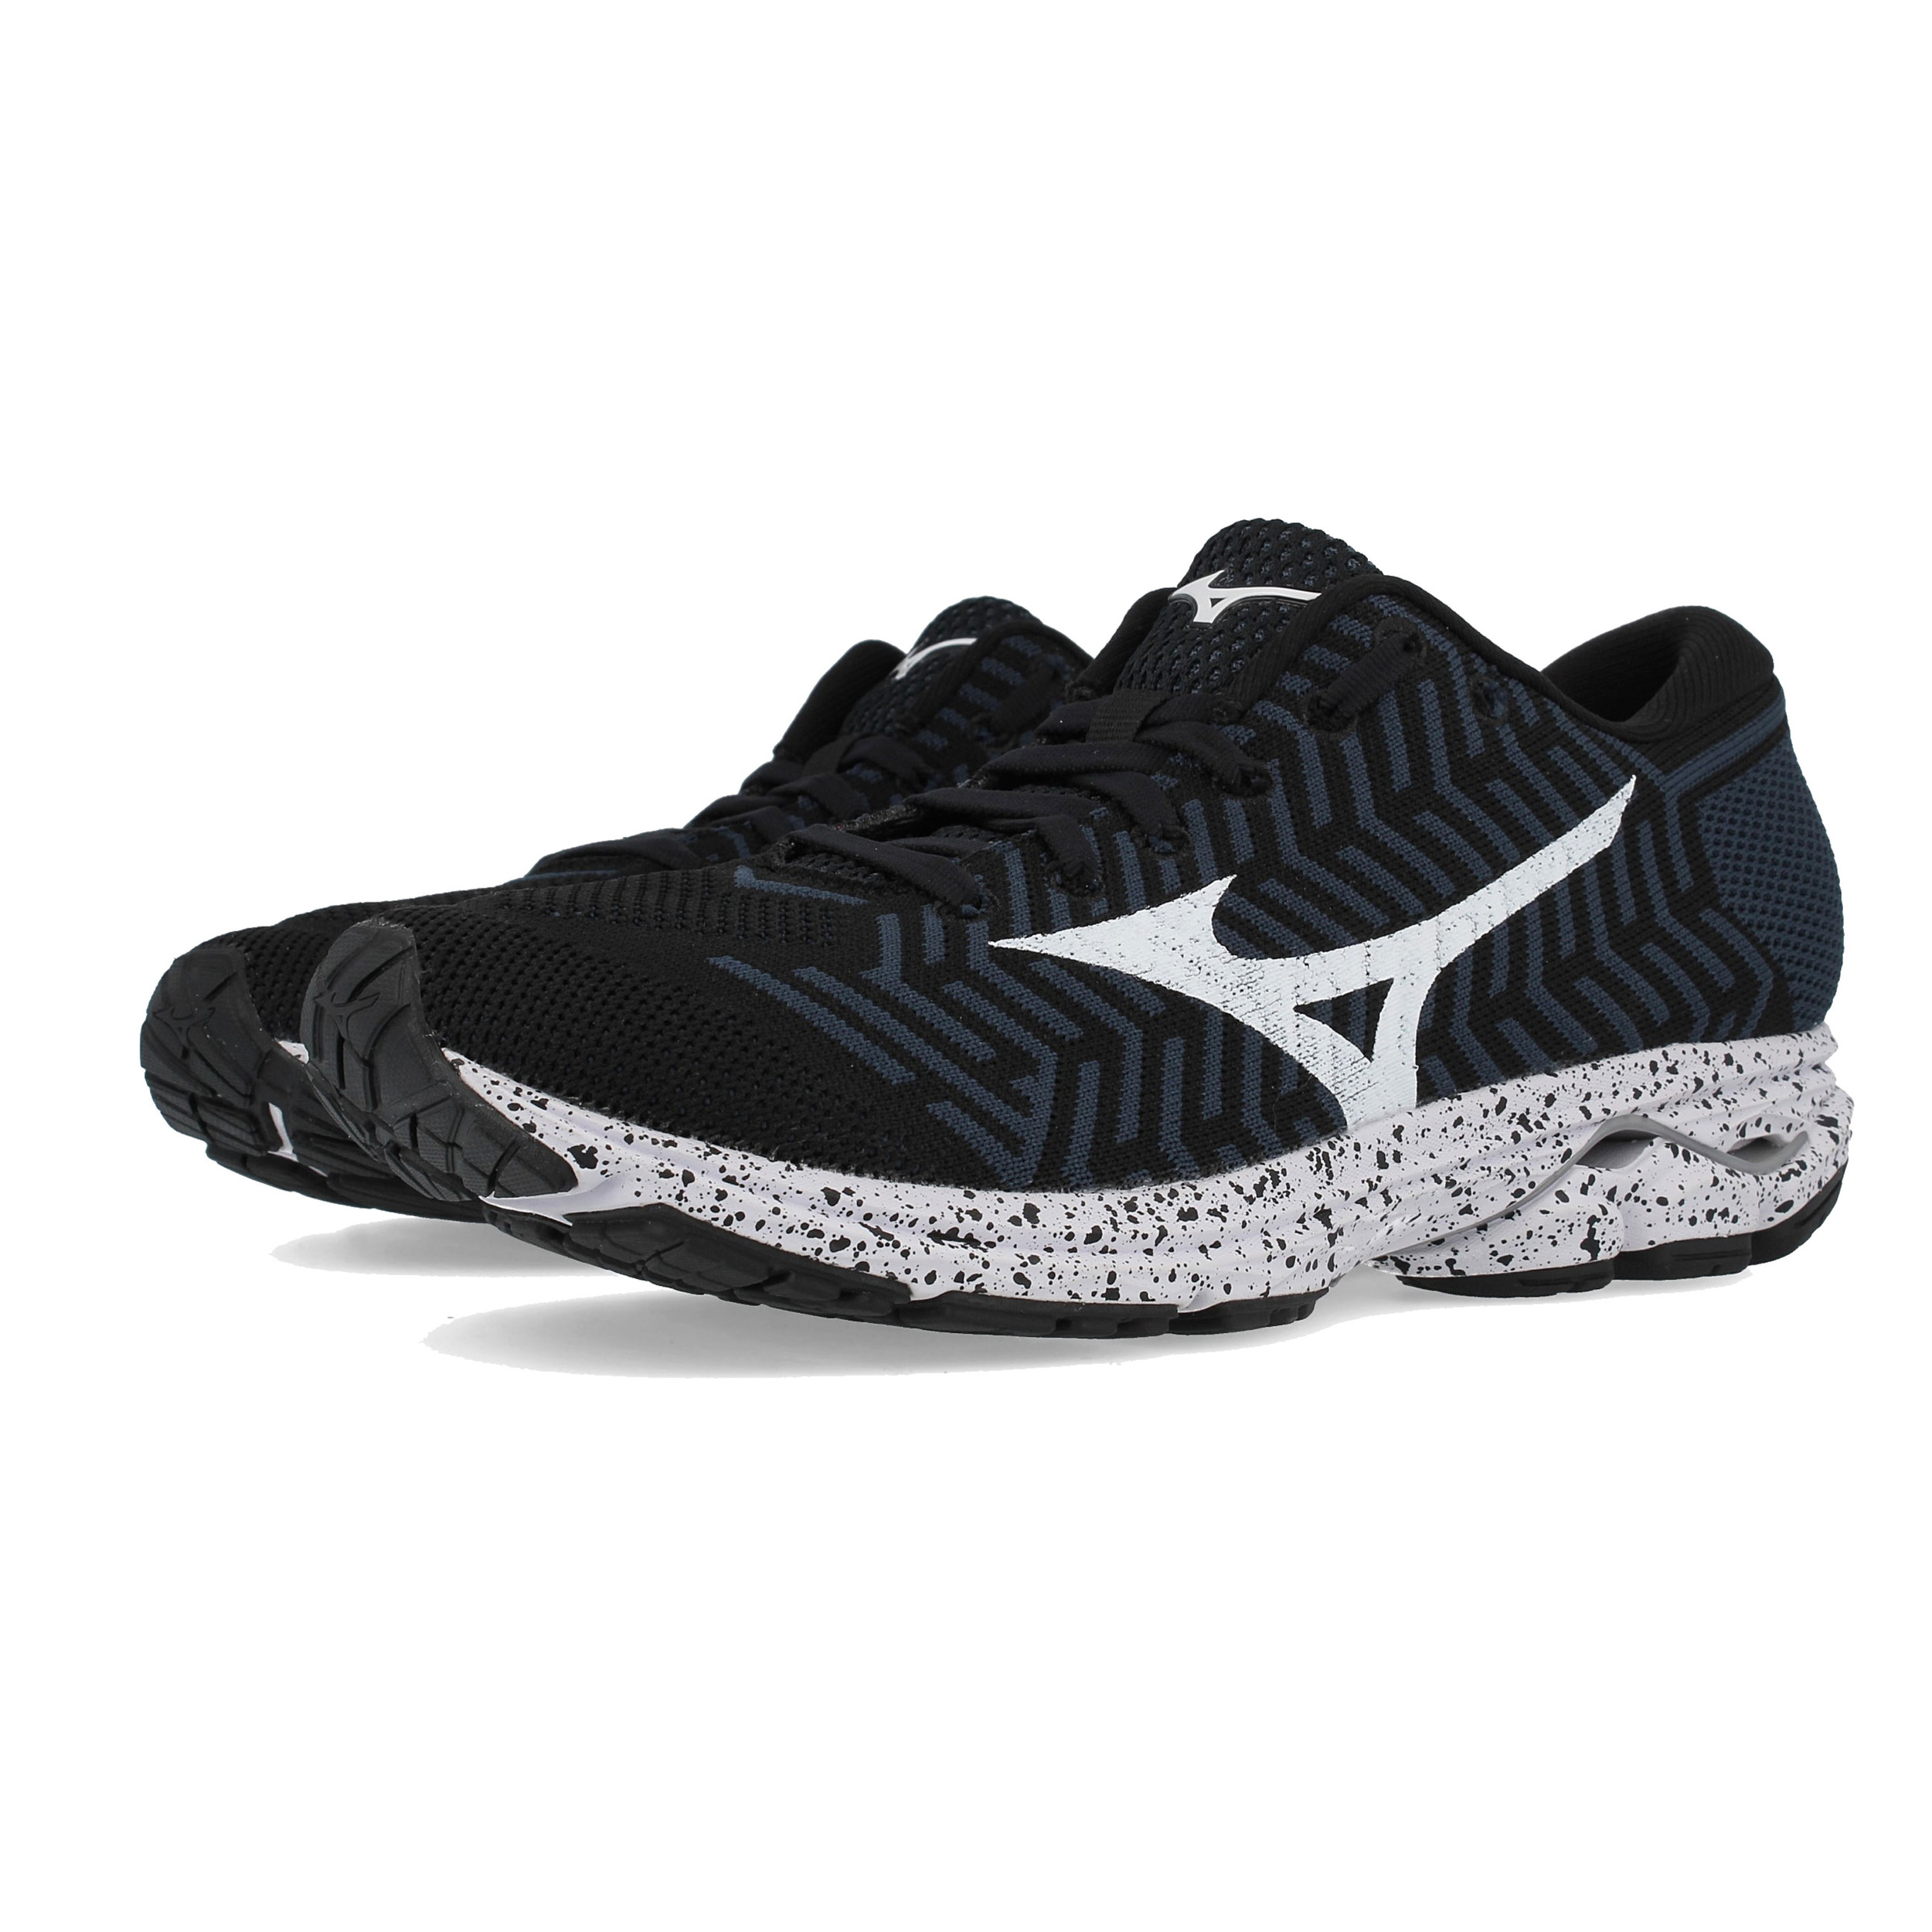 Mizuno Waveknit R2 Running Shoes